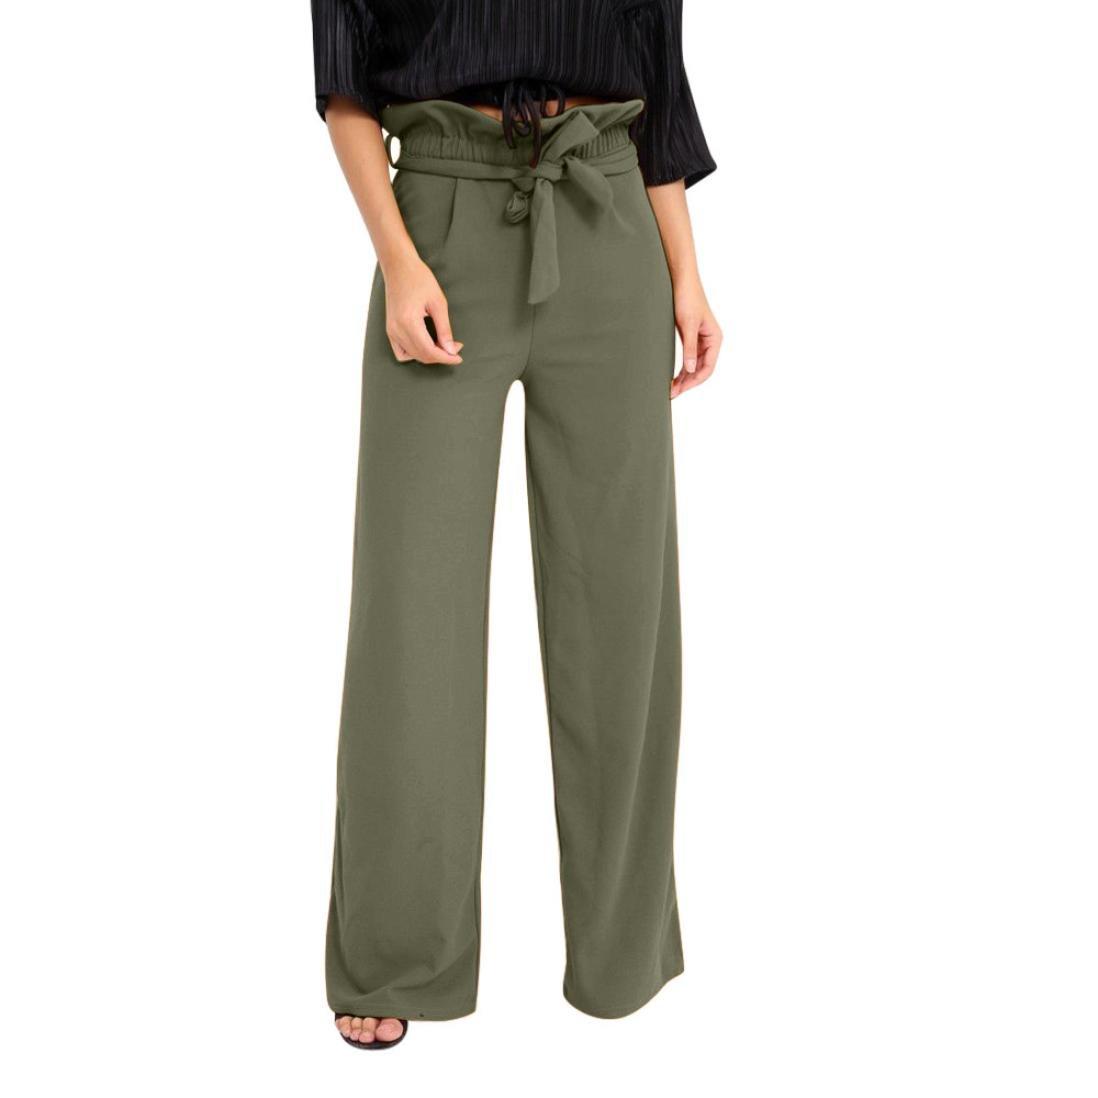 vermers Clearance Sale Summer Women Pants High Waist Speaker Wide Leg Straps Lotus Leaf Trousers(XL, Army Green)